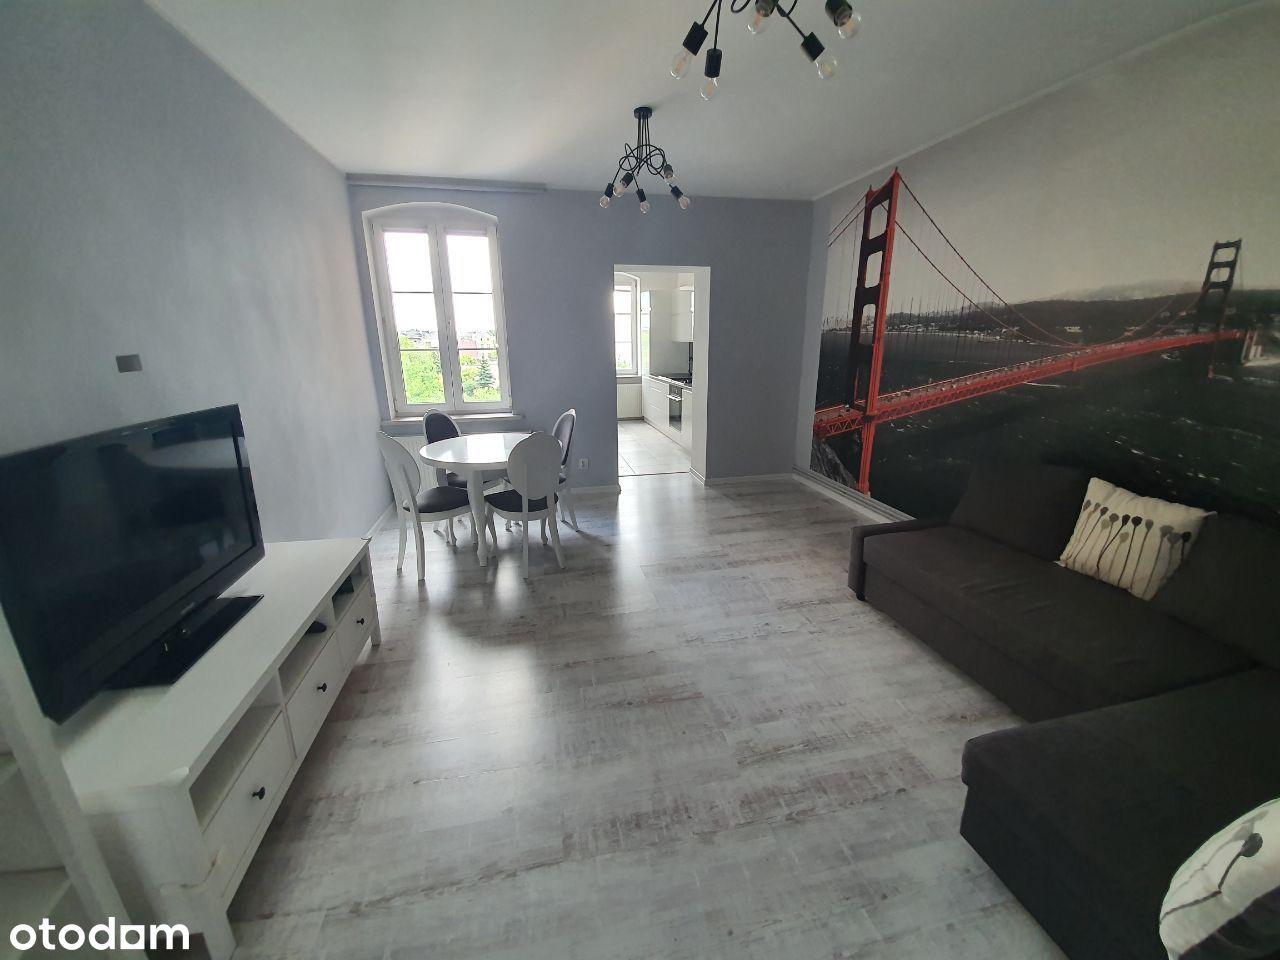 Mieszkanie 72 m2